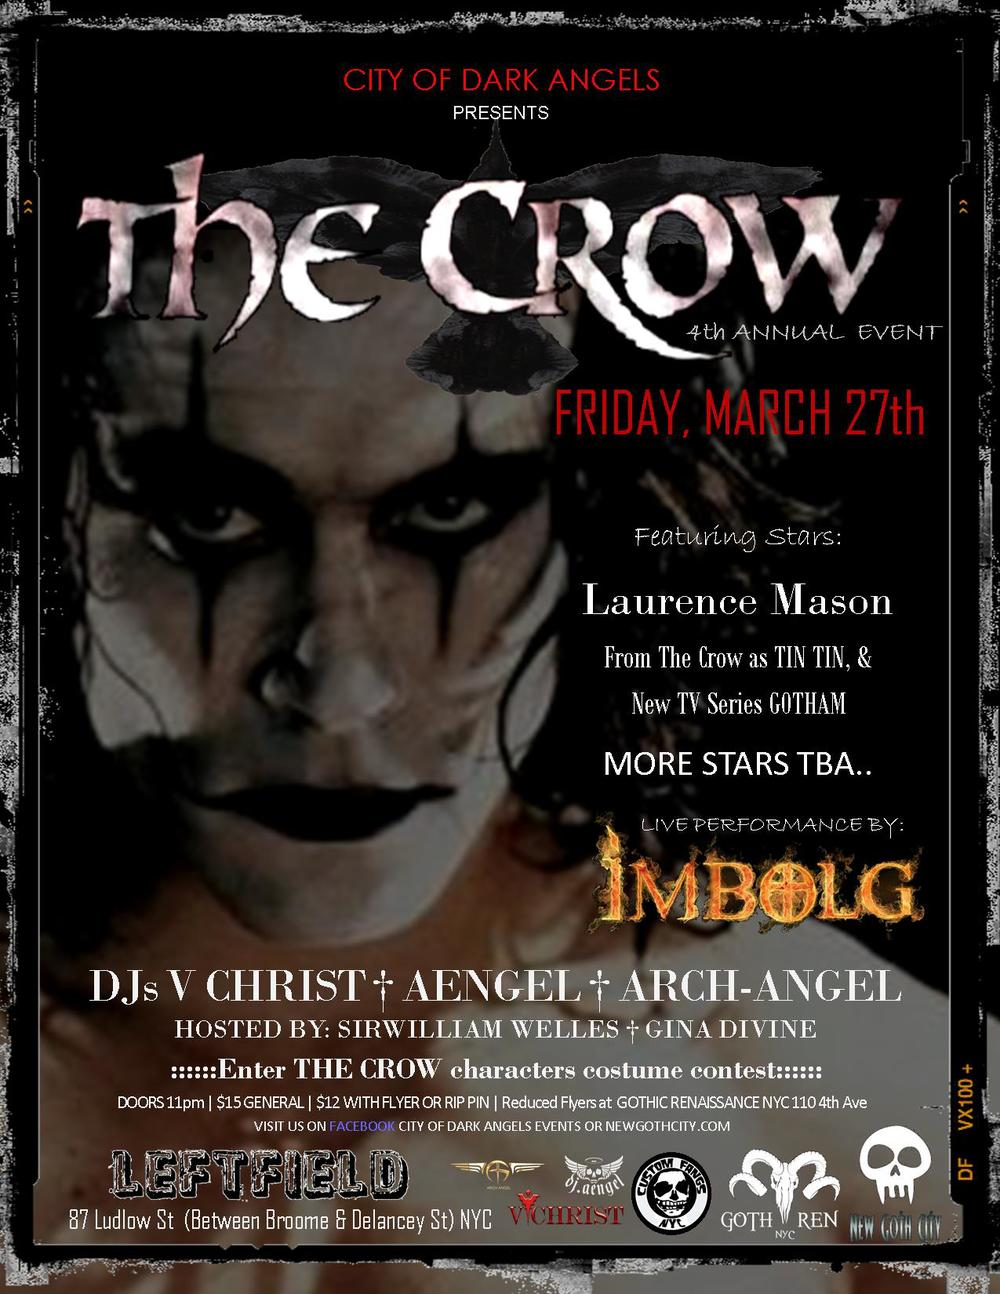 The Crow-03-27-15